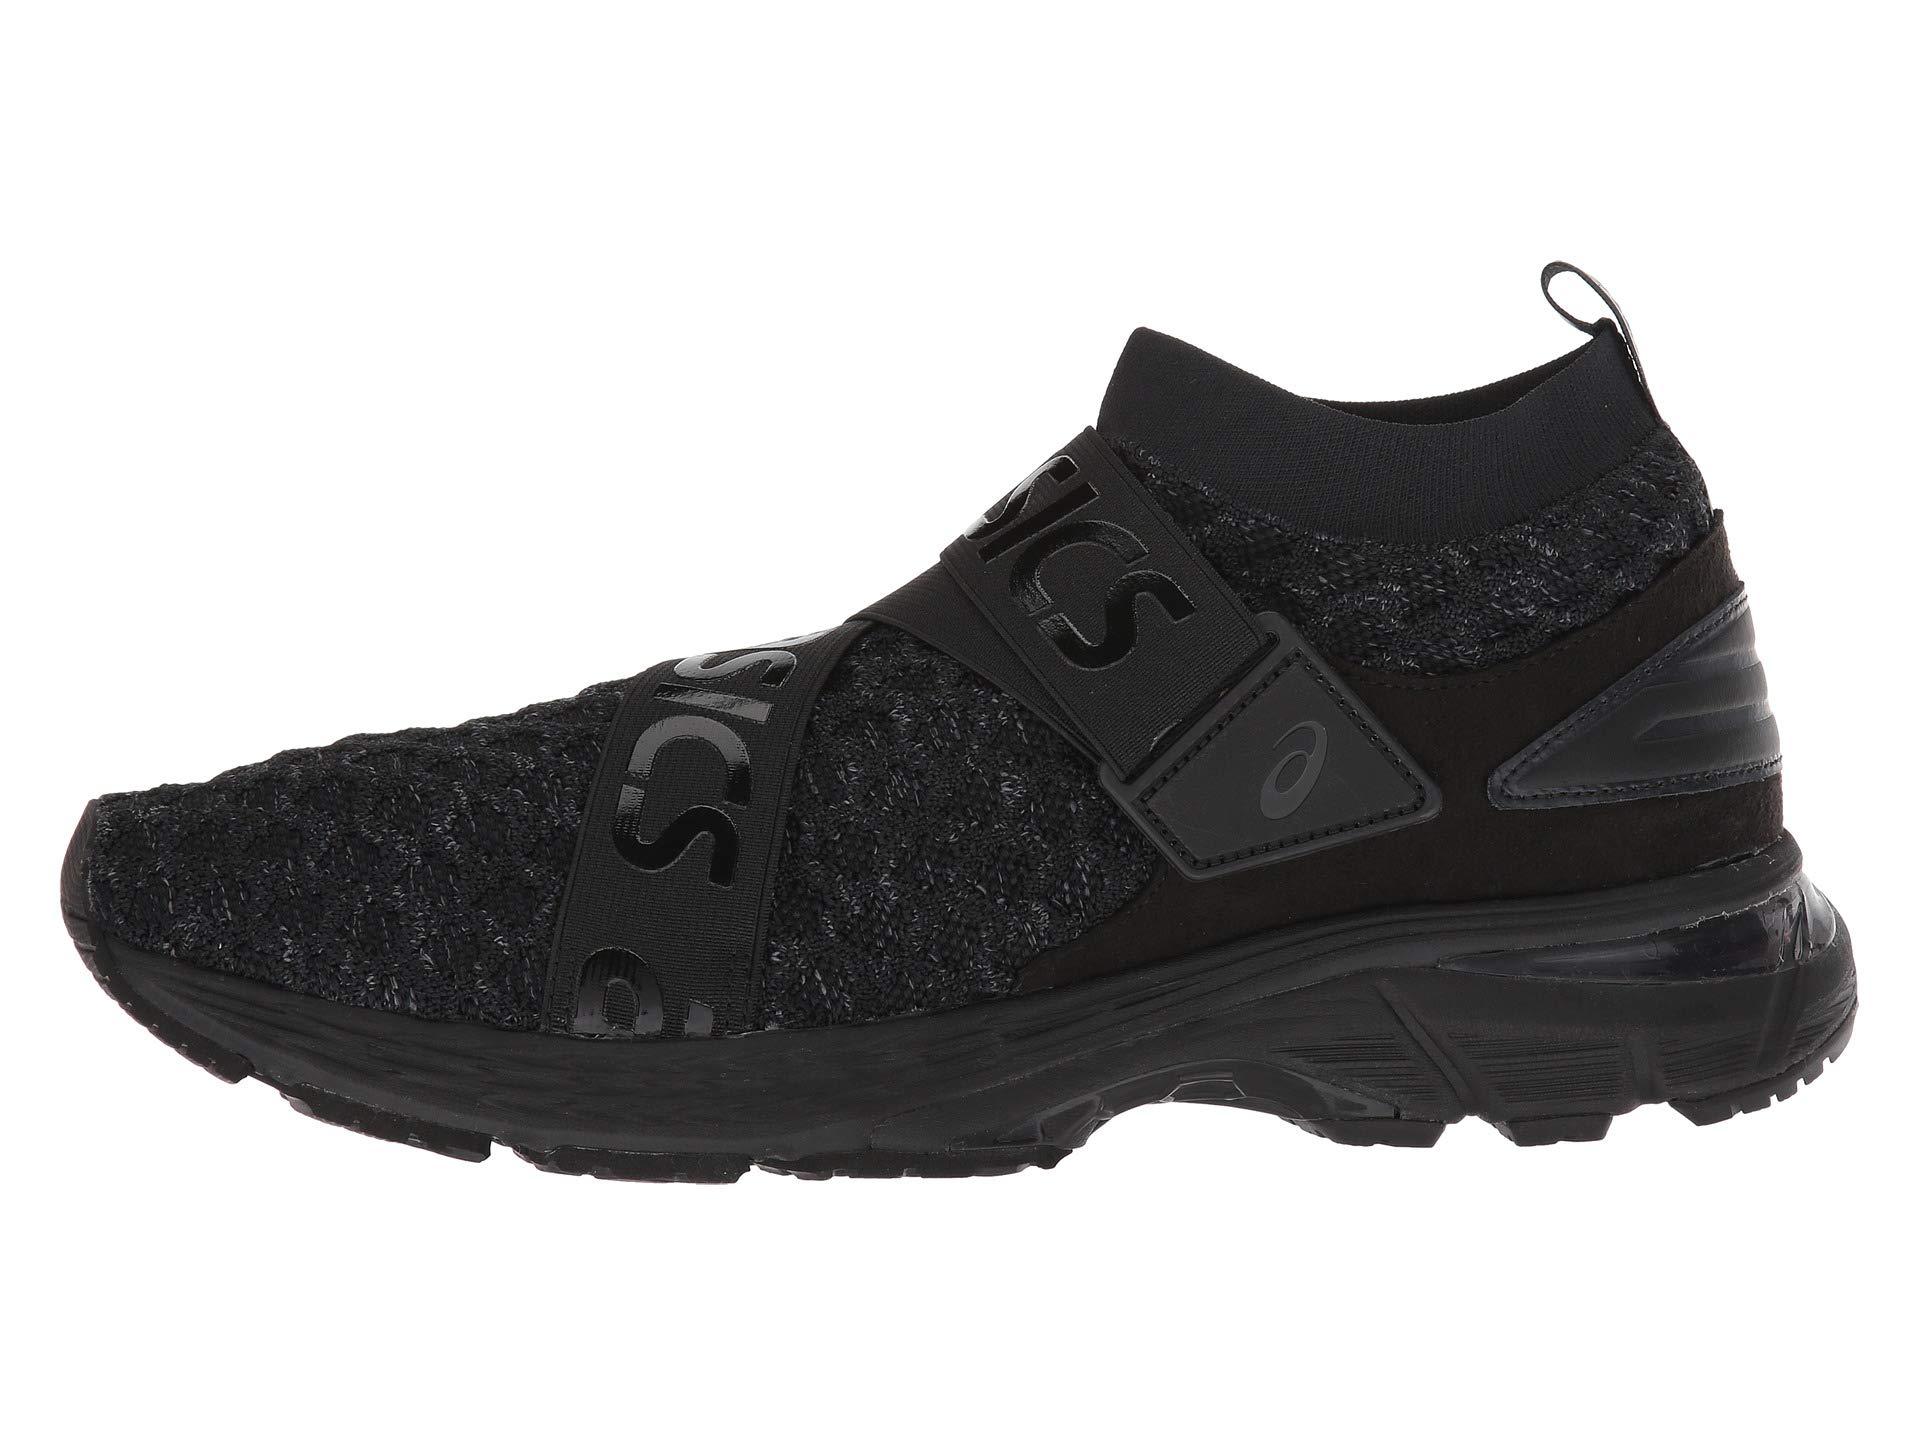 71qcalzSx%2BL - ASICS Mens Gel-Kayano 25 Obistag Black/Carbon Running Shoe - 9